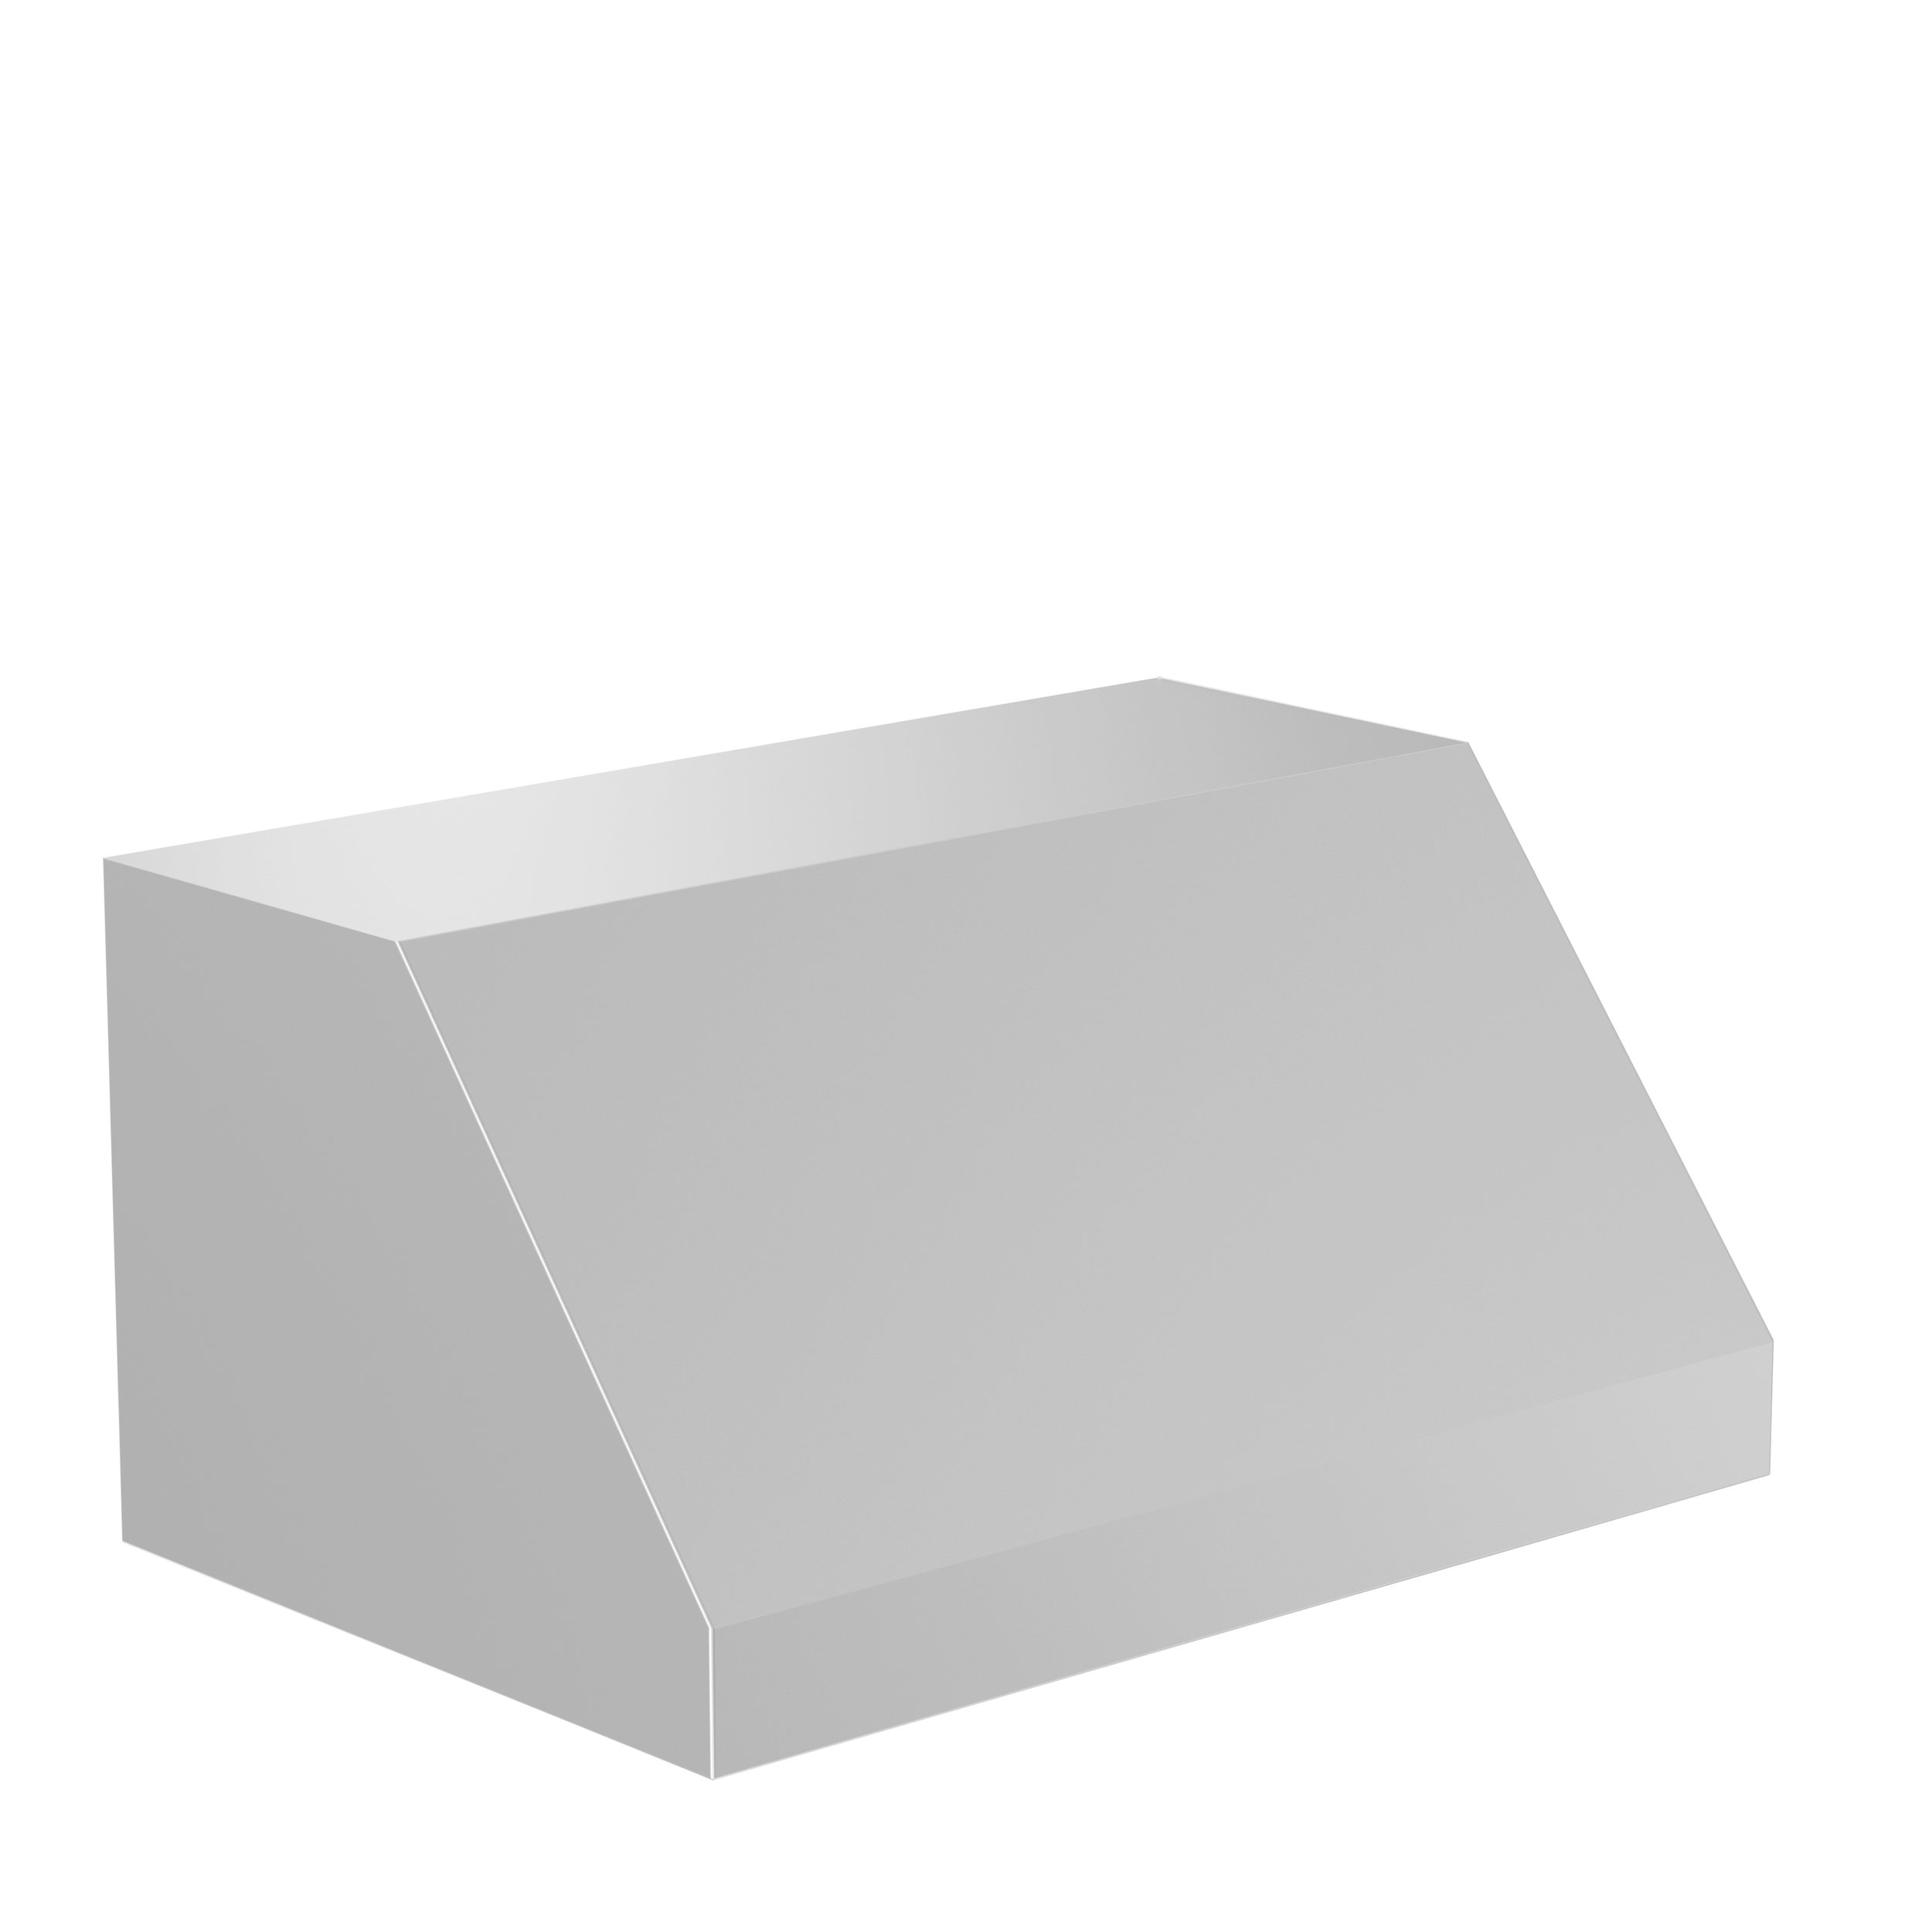 zline-stainless-steel-under-cabinet-range-hood-523-top.jpeg